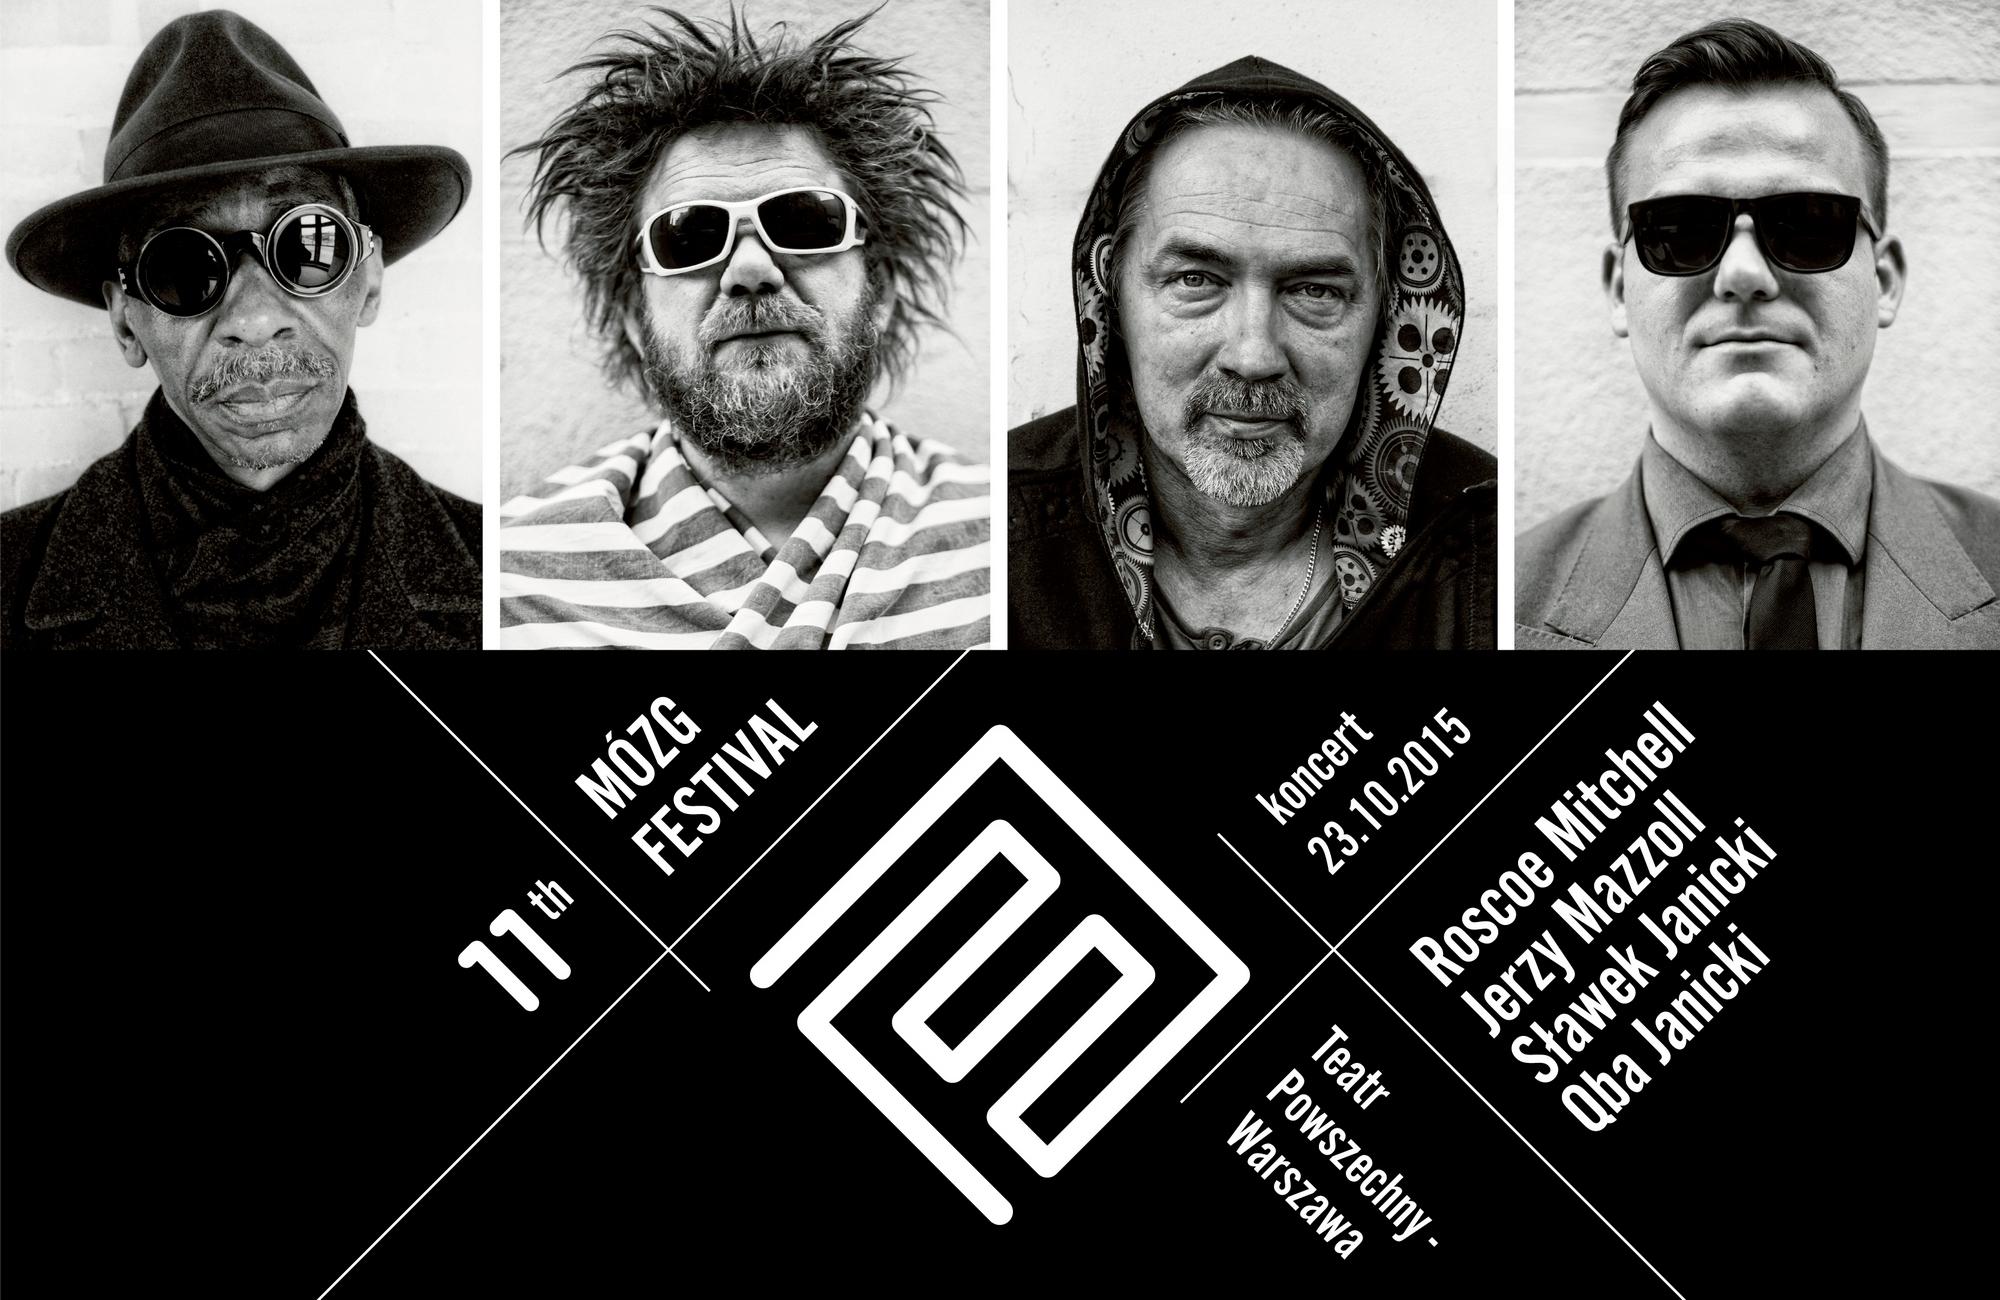 Koncert 11th Mózg Festival (źródło: materiały prasowe organizatora)